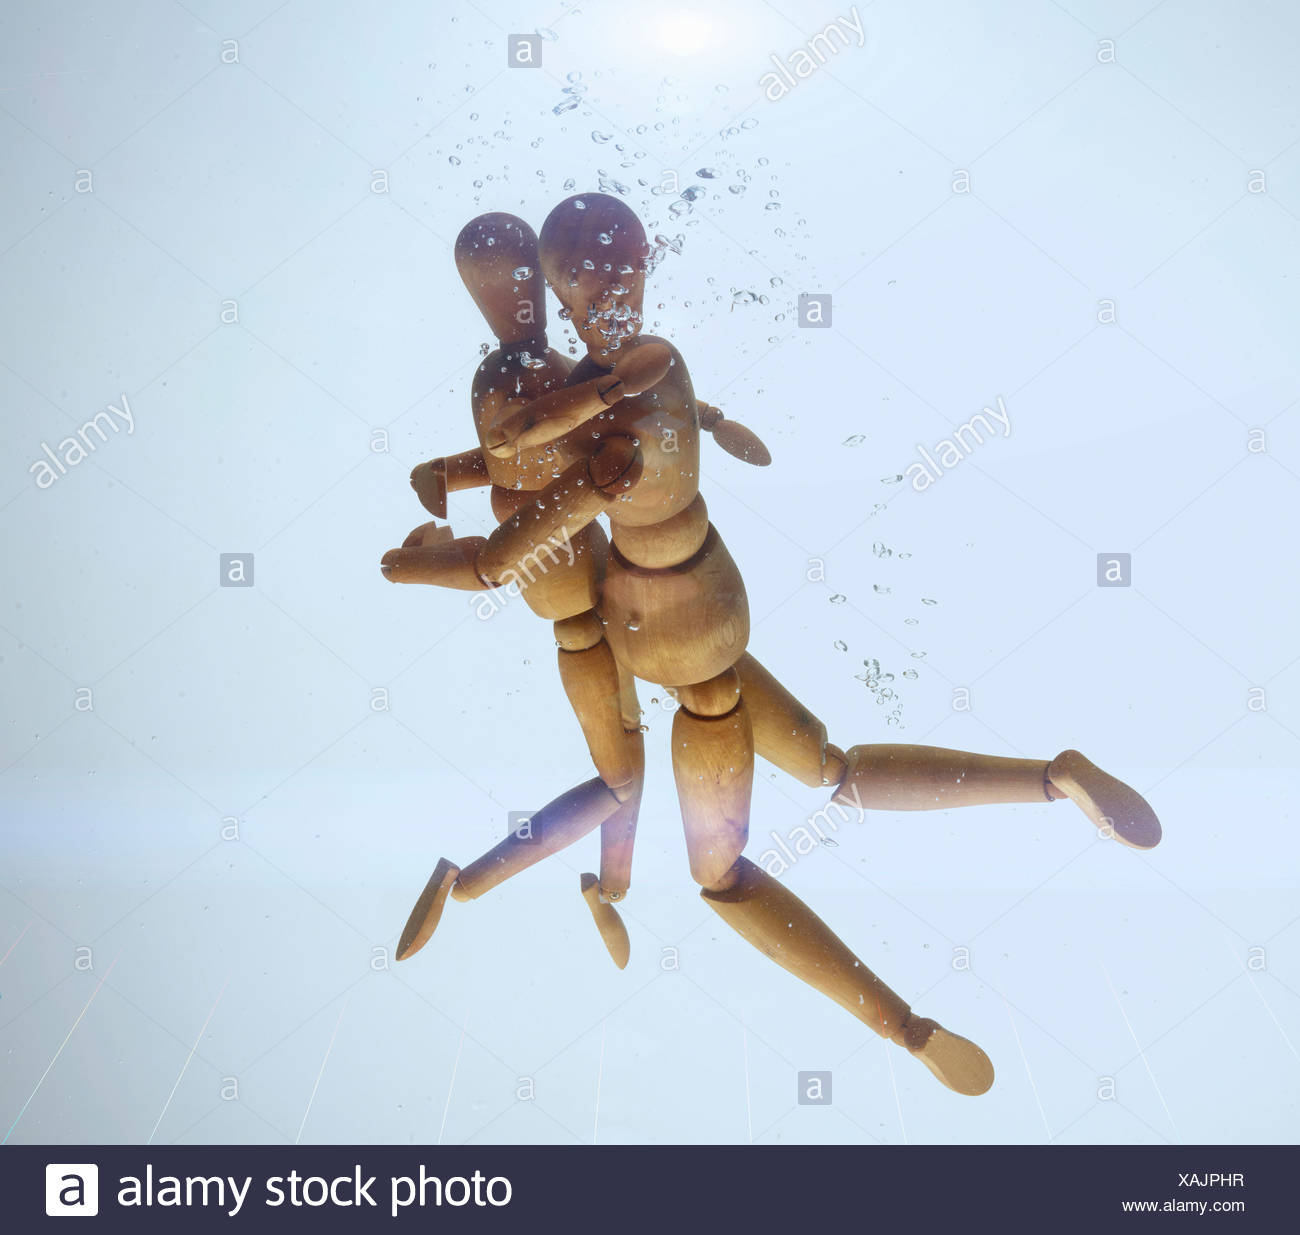 Wooden figurines hugging in water - Stock Image